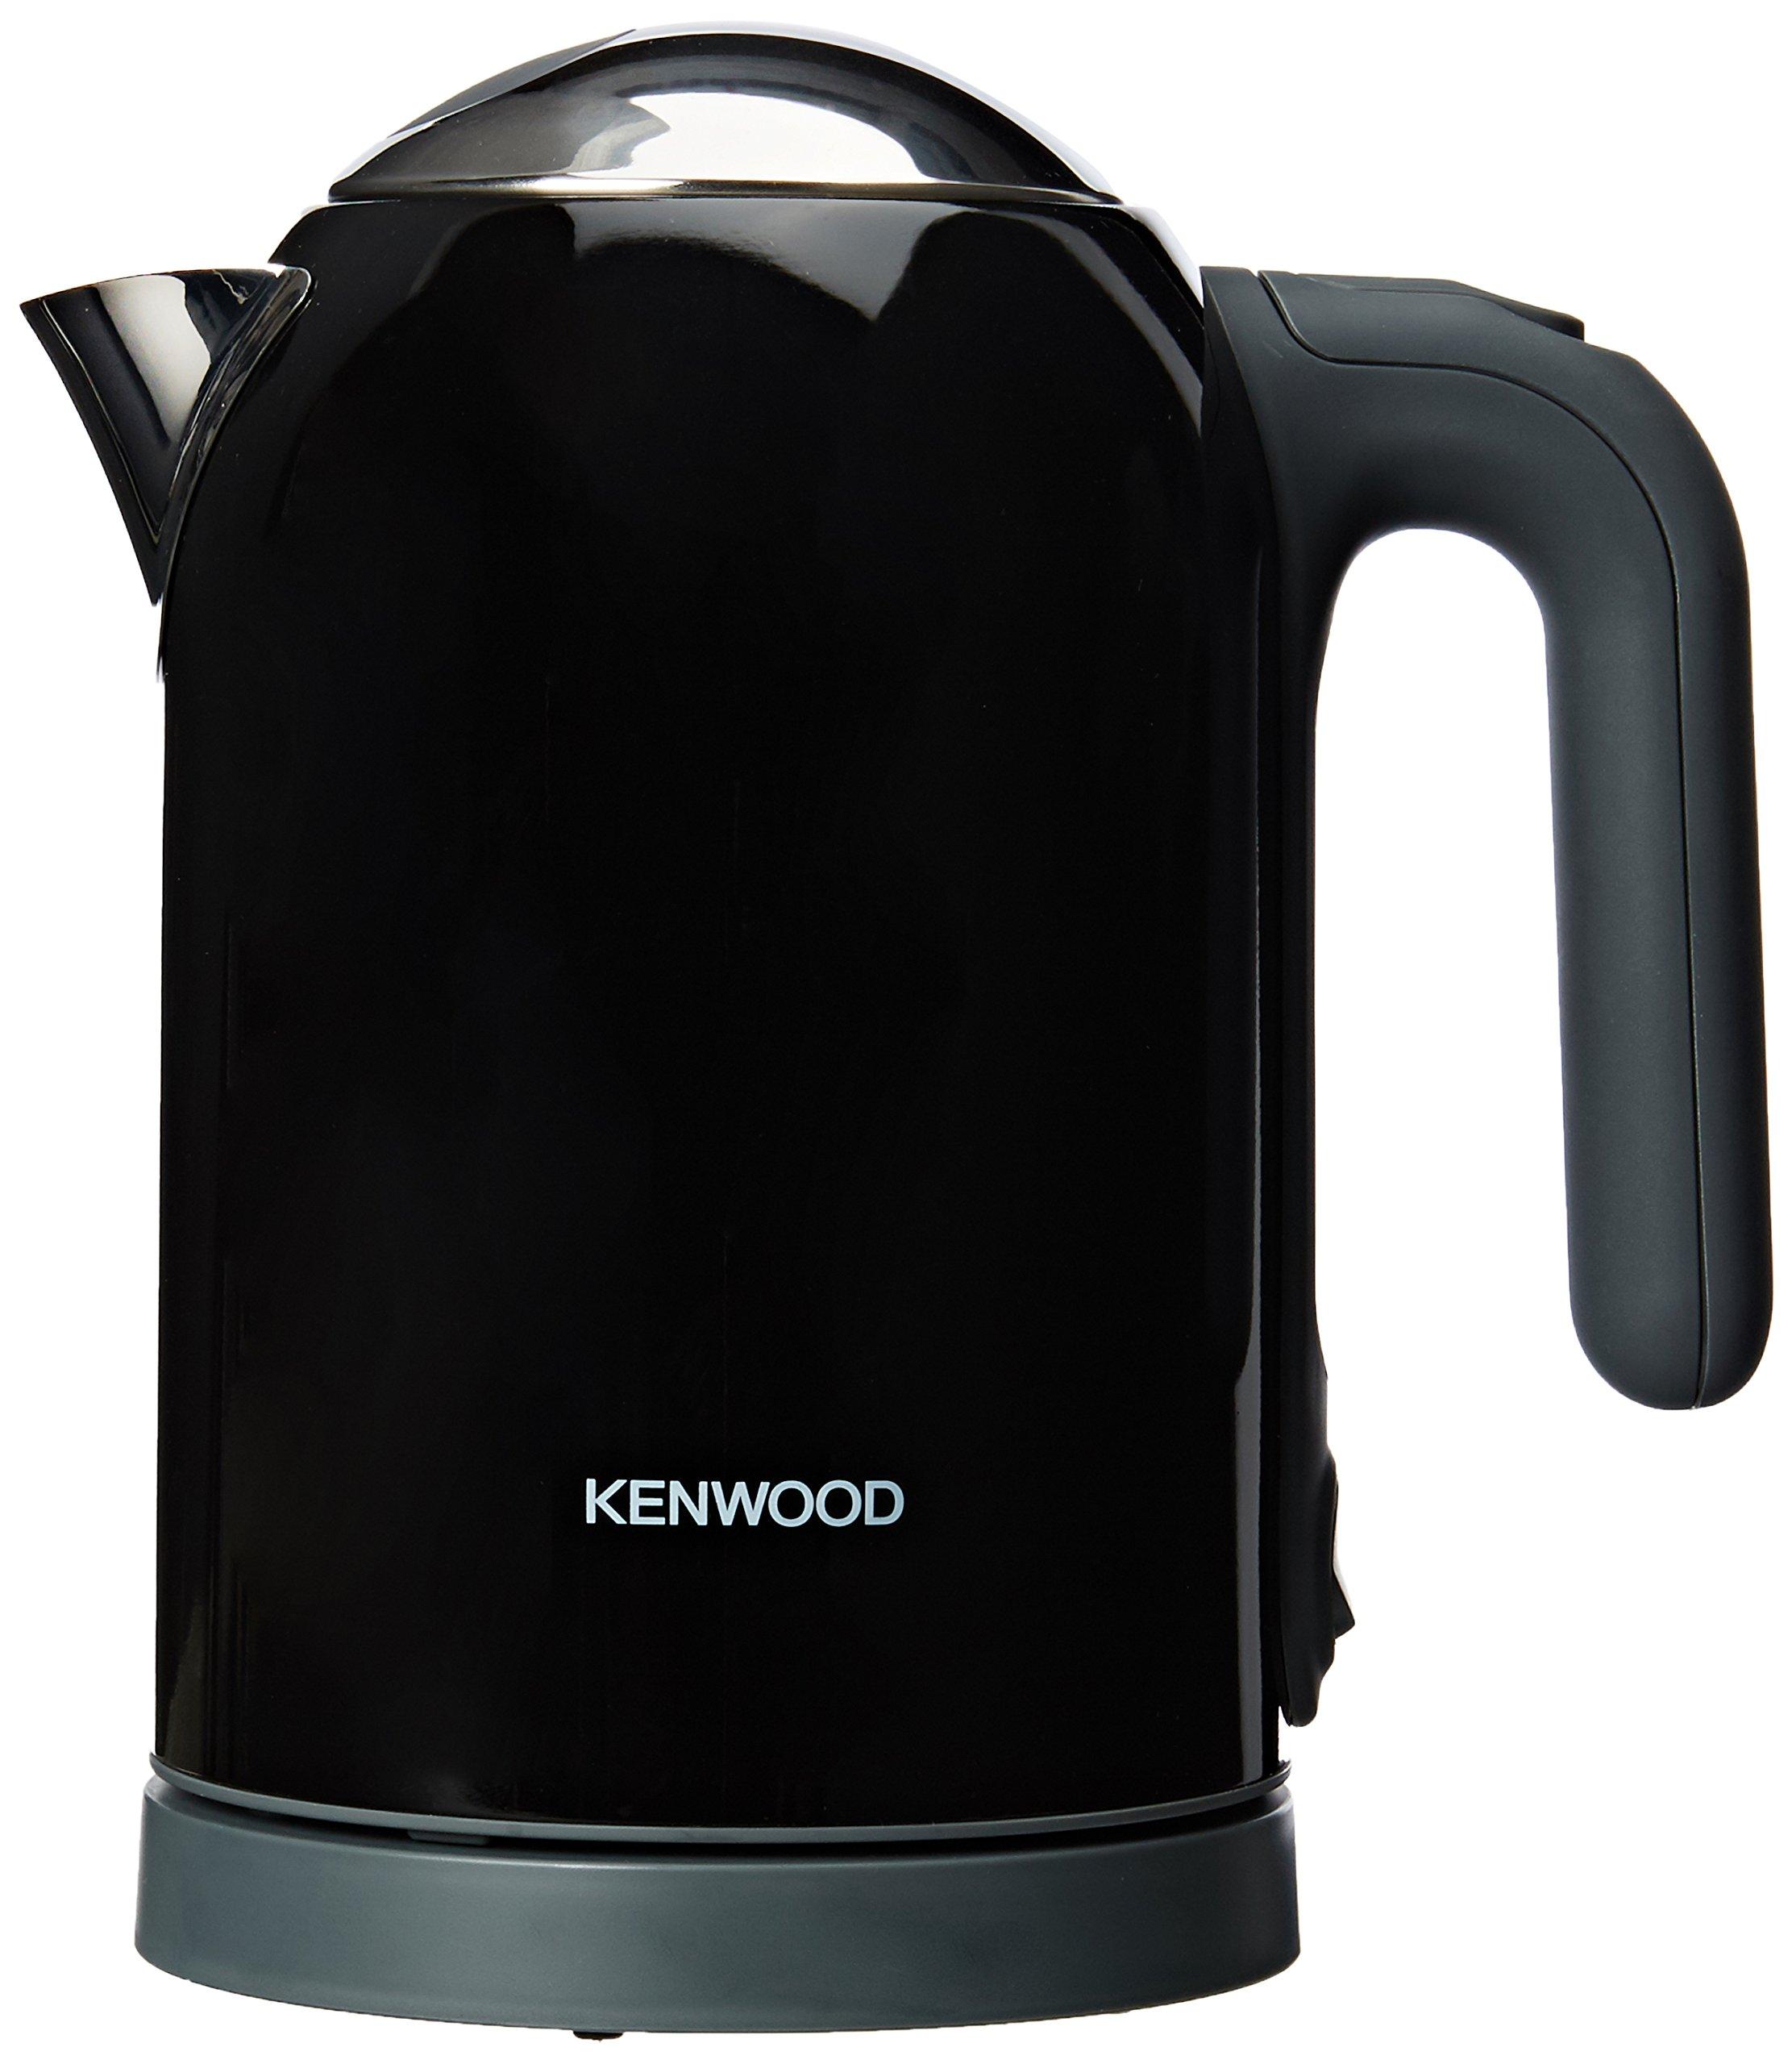 Kenwood Scene ZJM180WH Kettle White